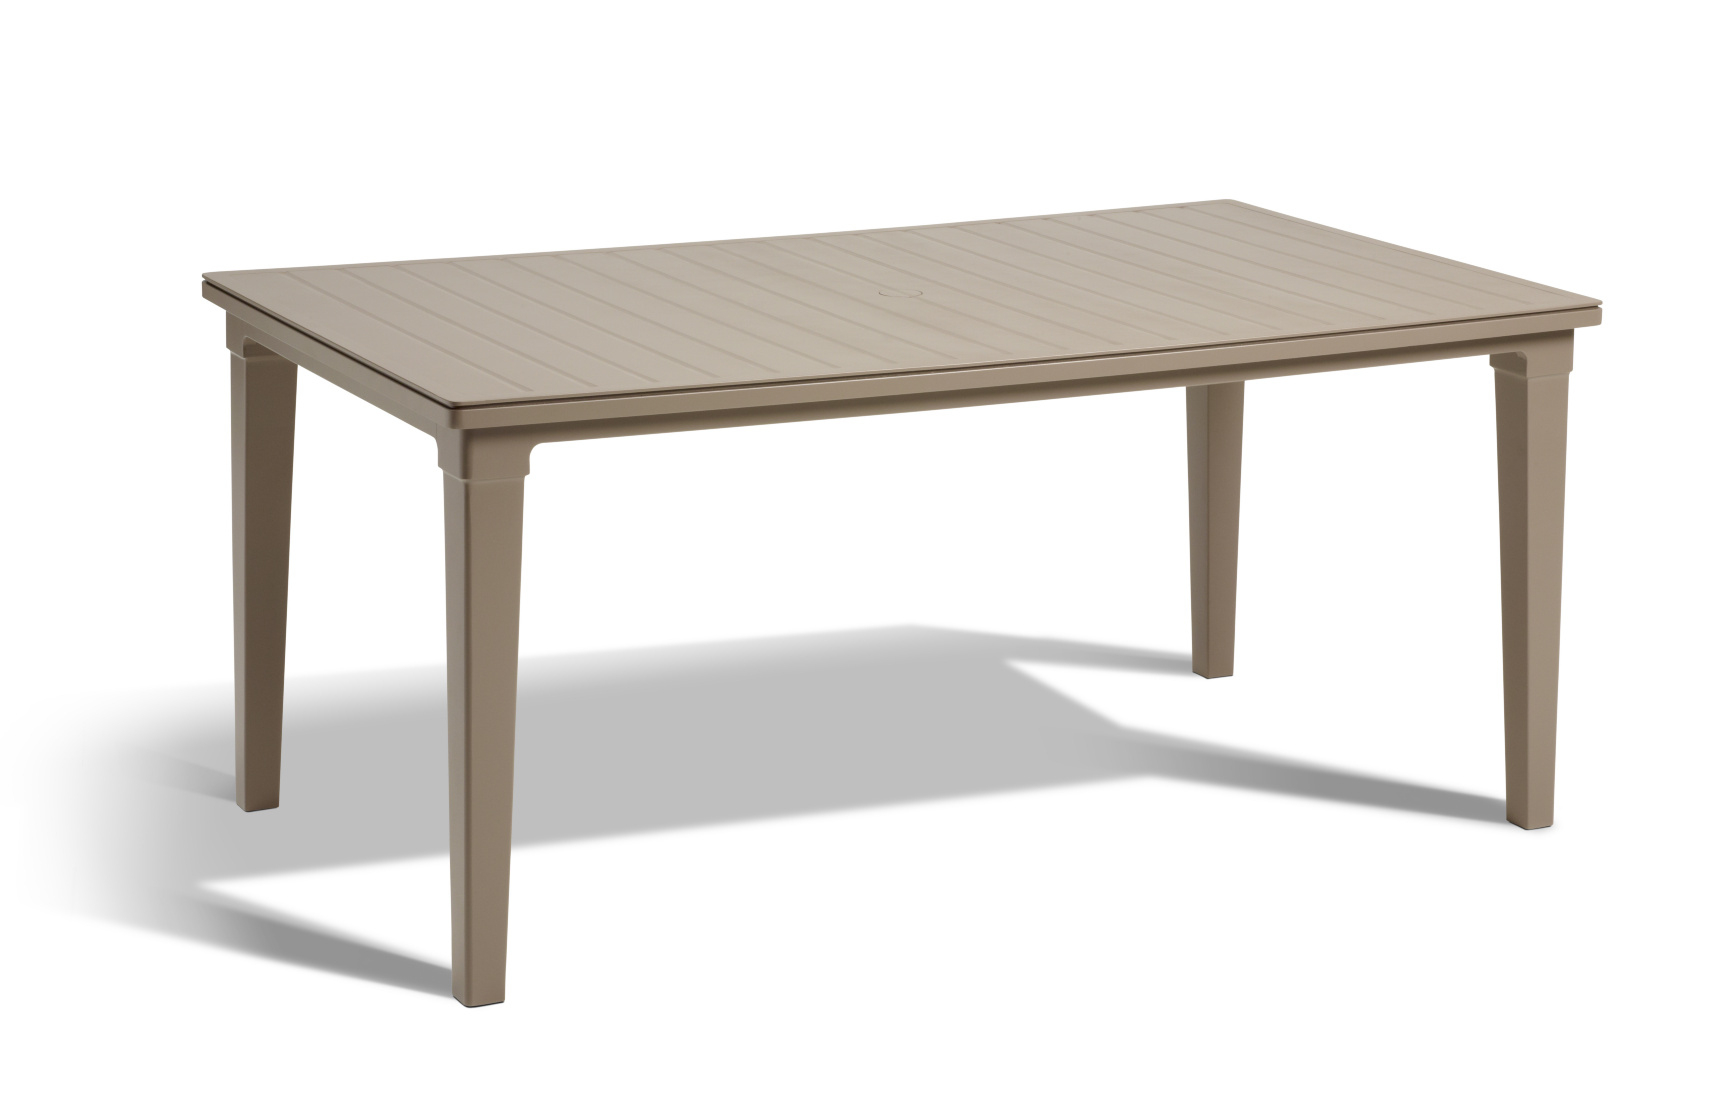 Tables De Jardin - Allibert tout Allibert Table De Jardin